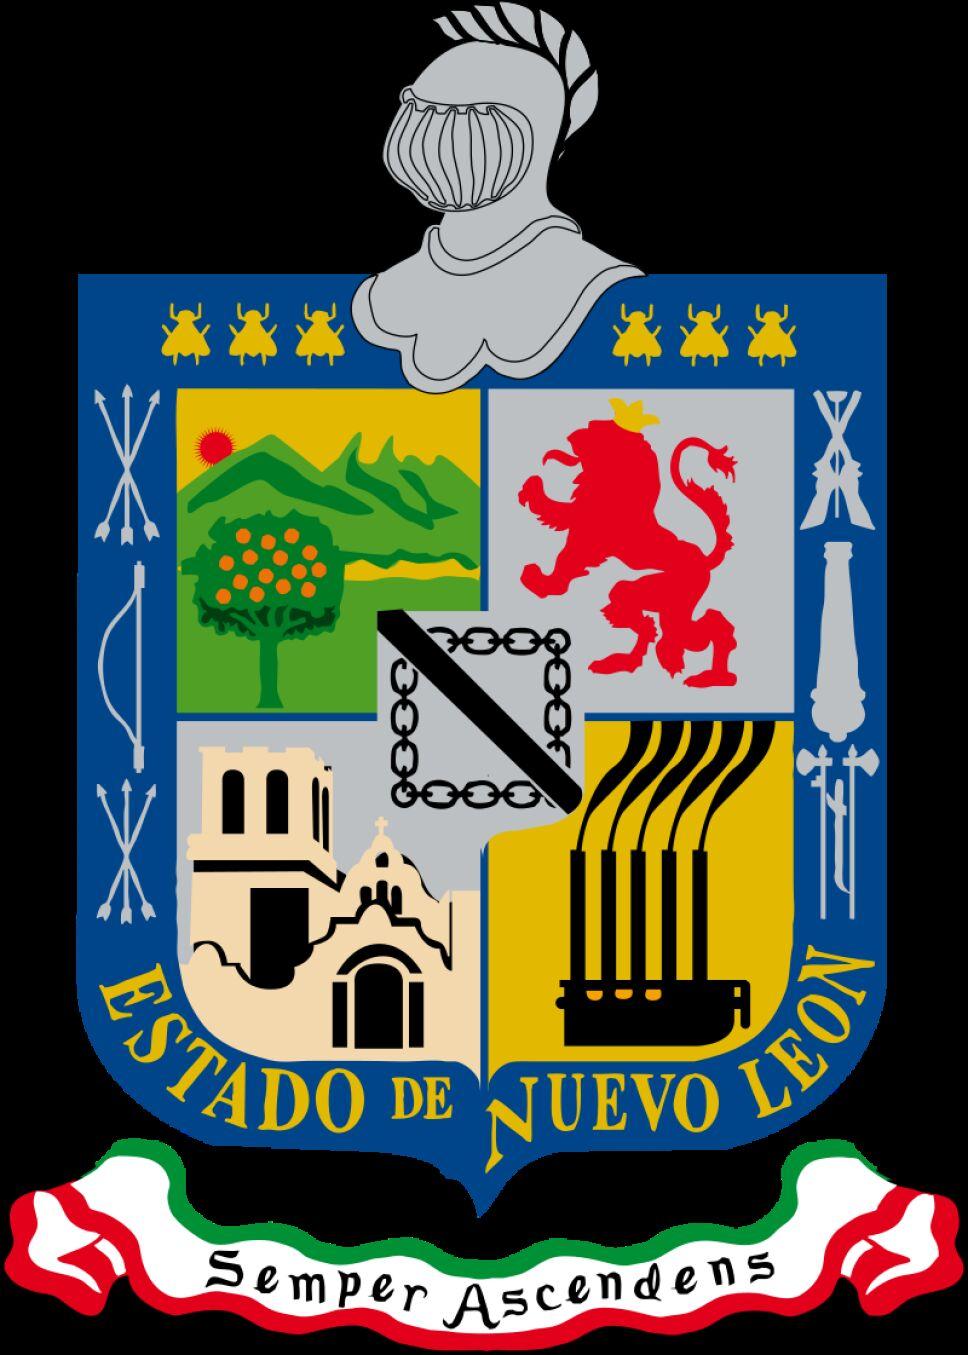 escudo-nuevo lepon.png